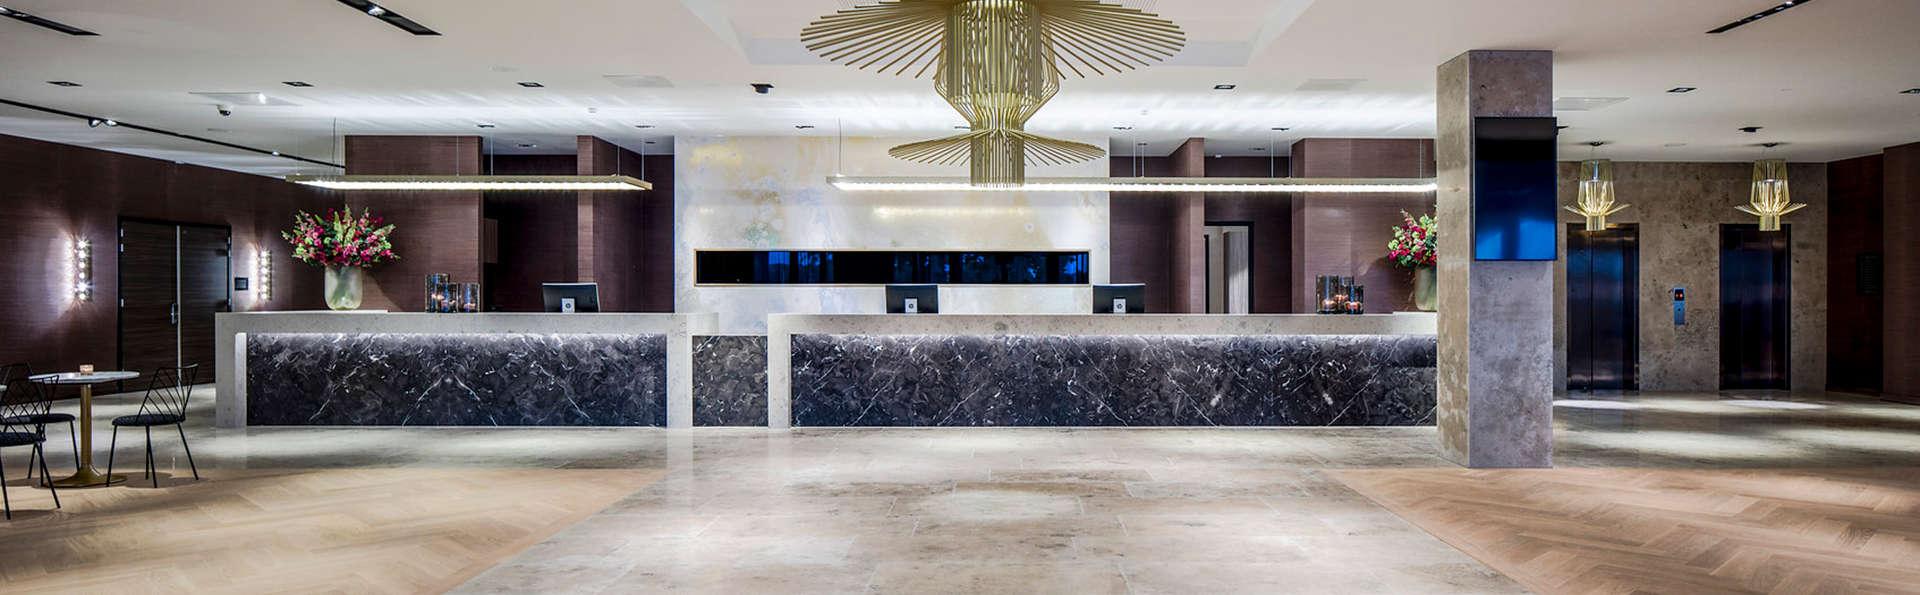 Van der Valk Hotel Enschede - Edit_Reception.jpg